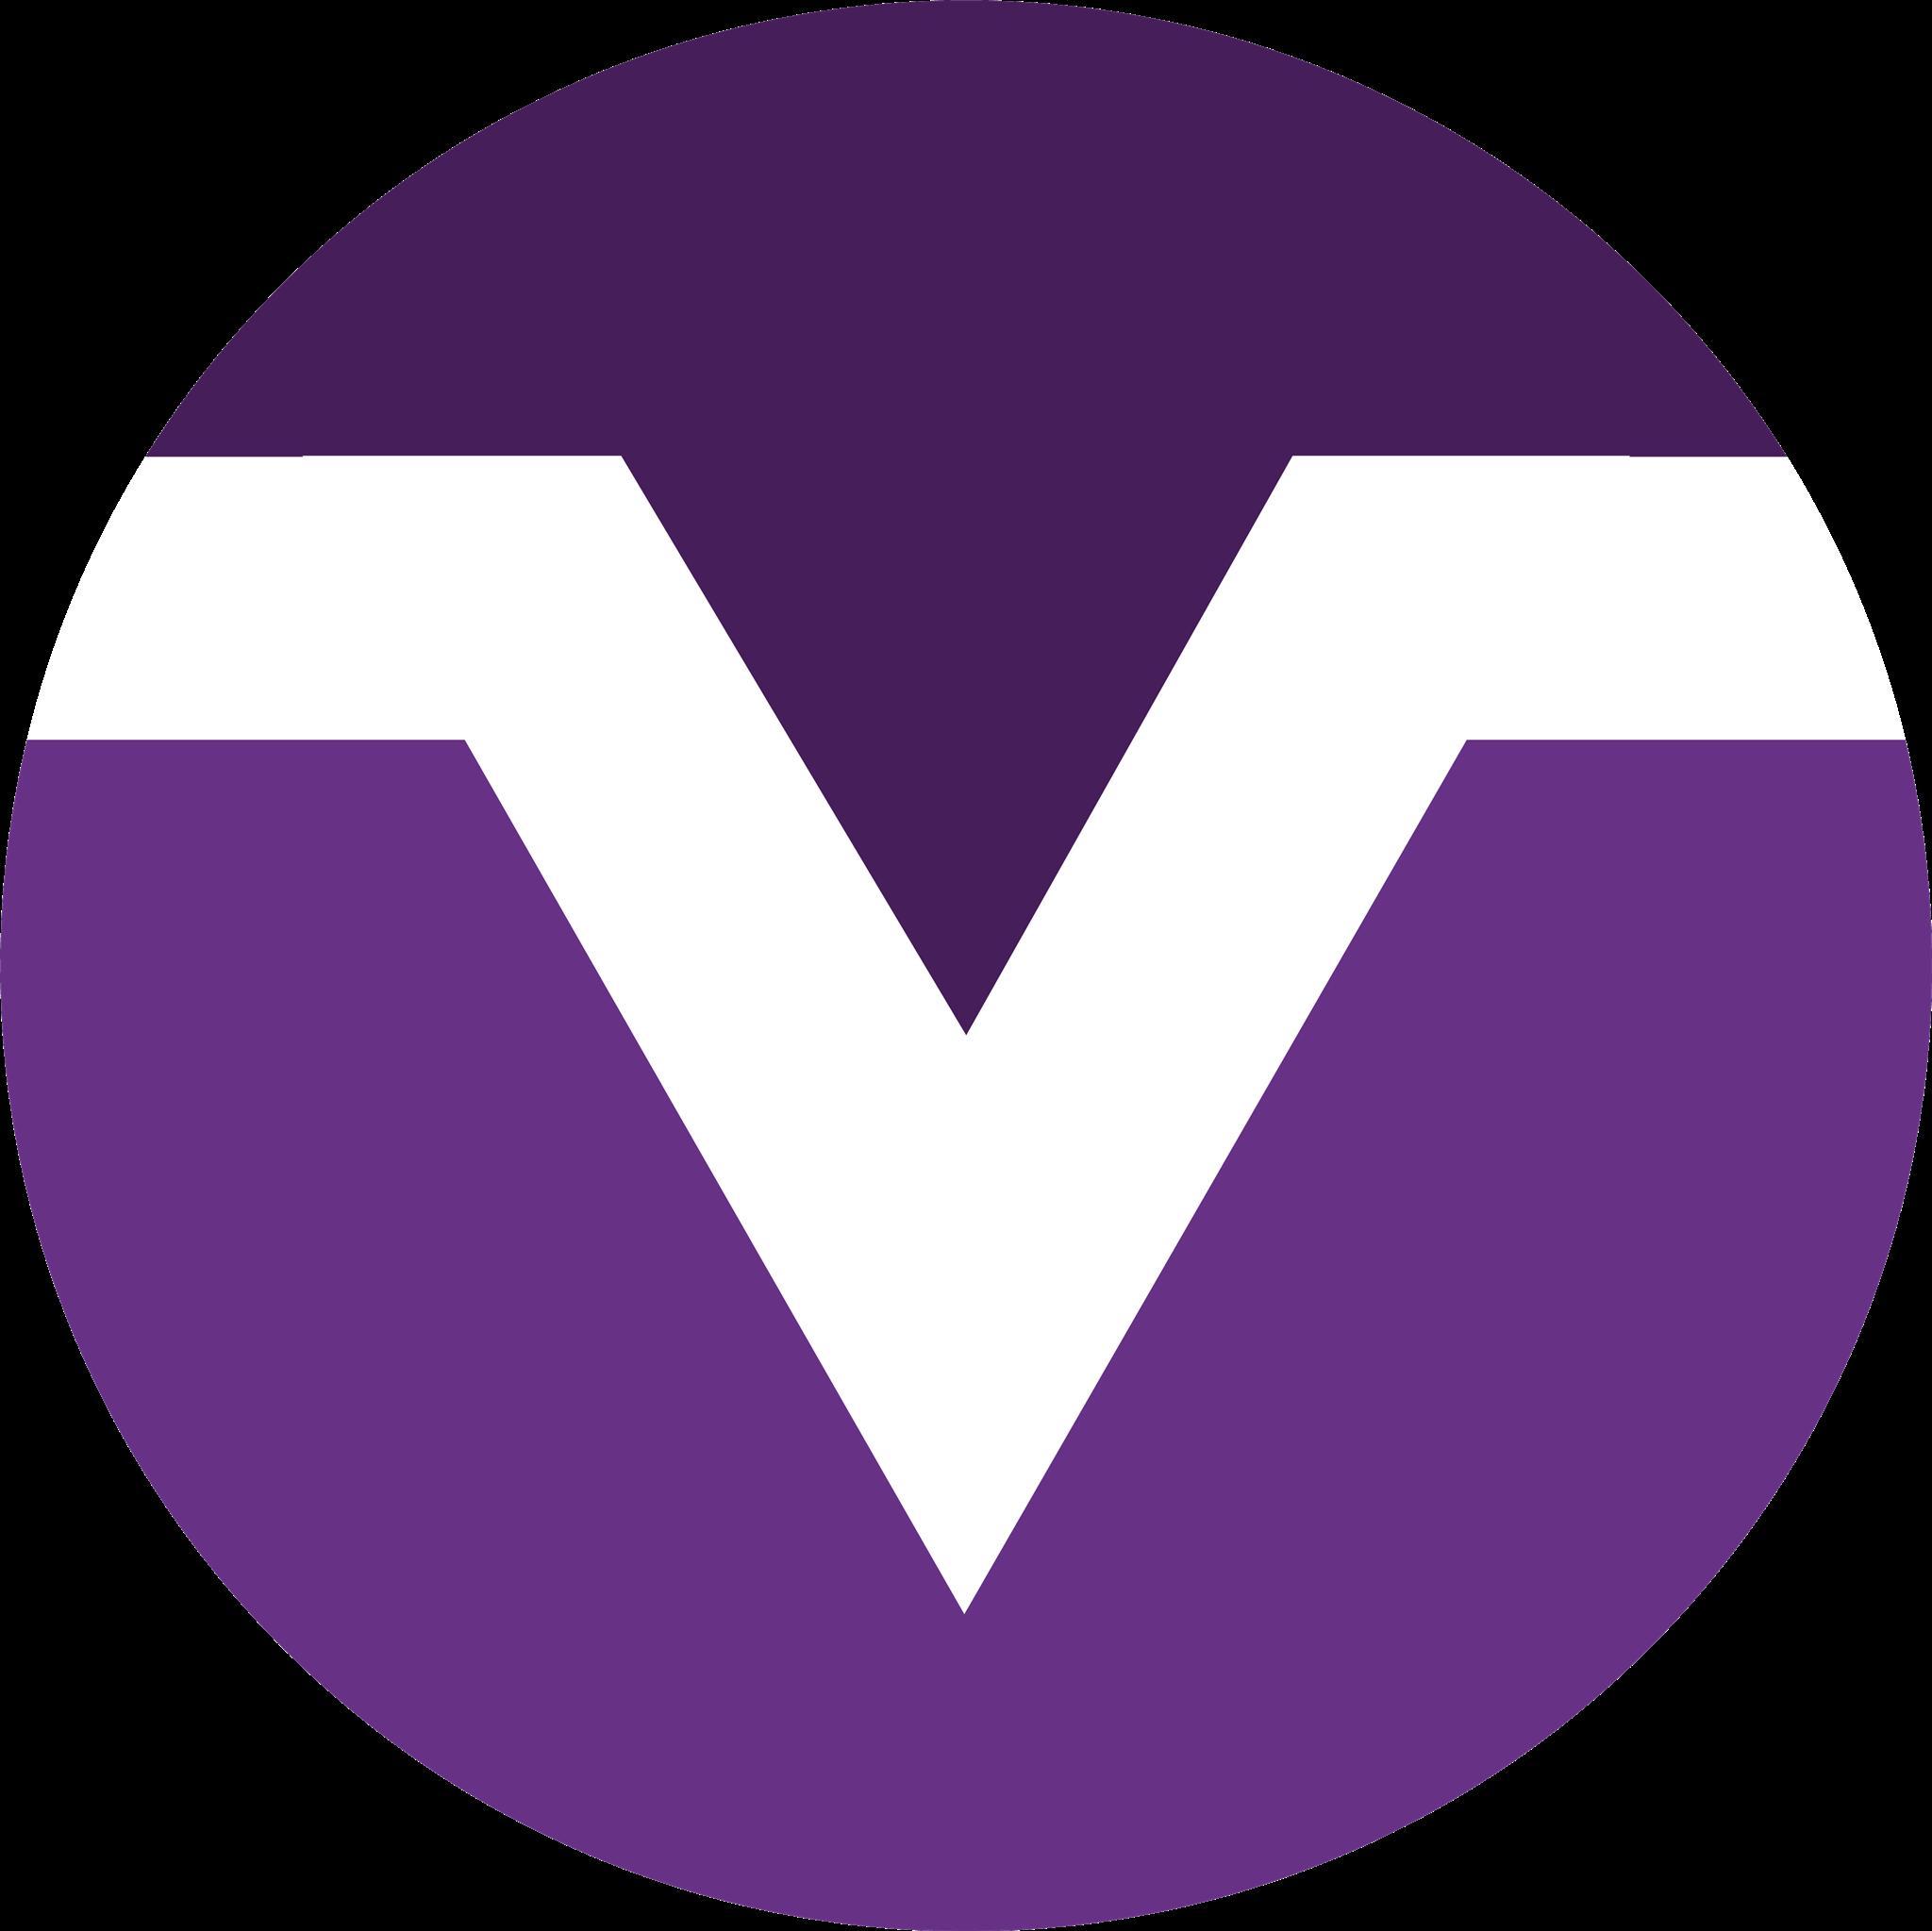 MoneroV | Private Cryptocurrency